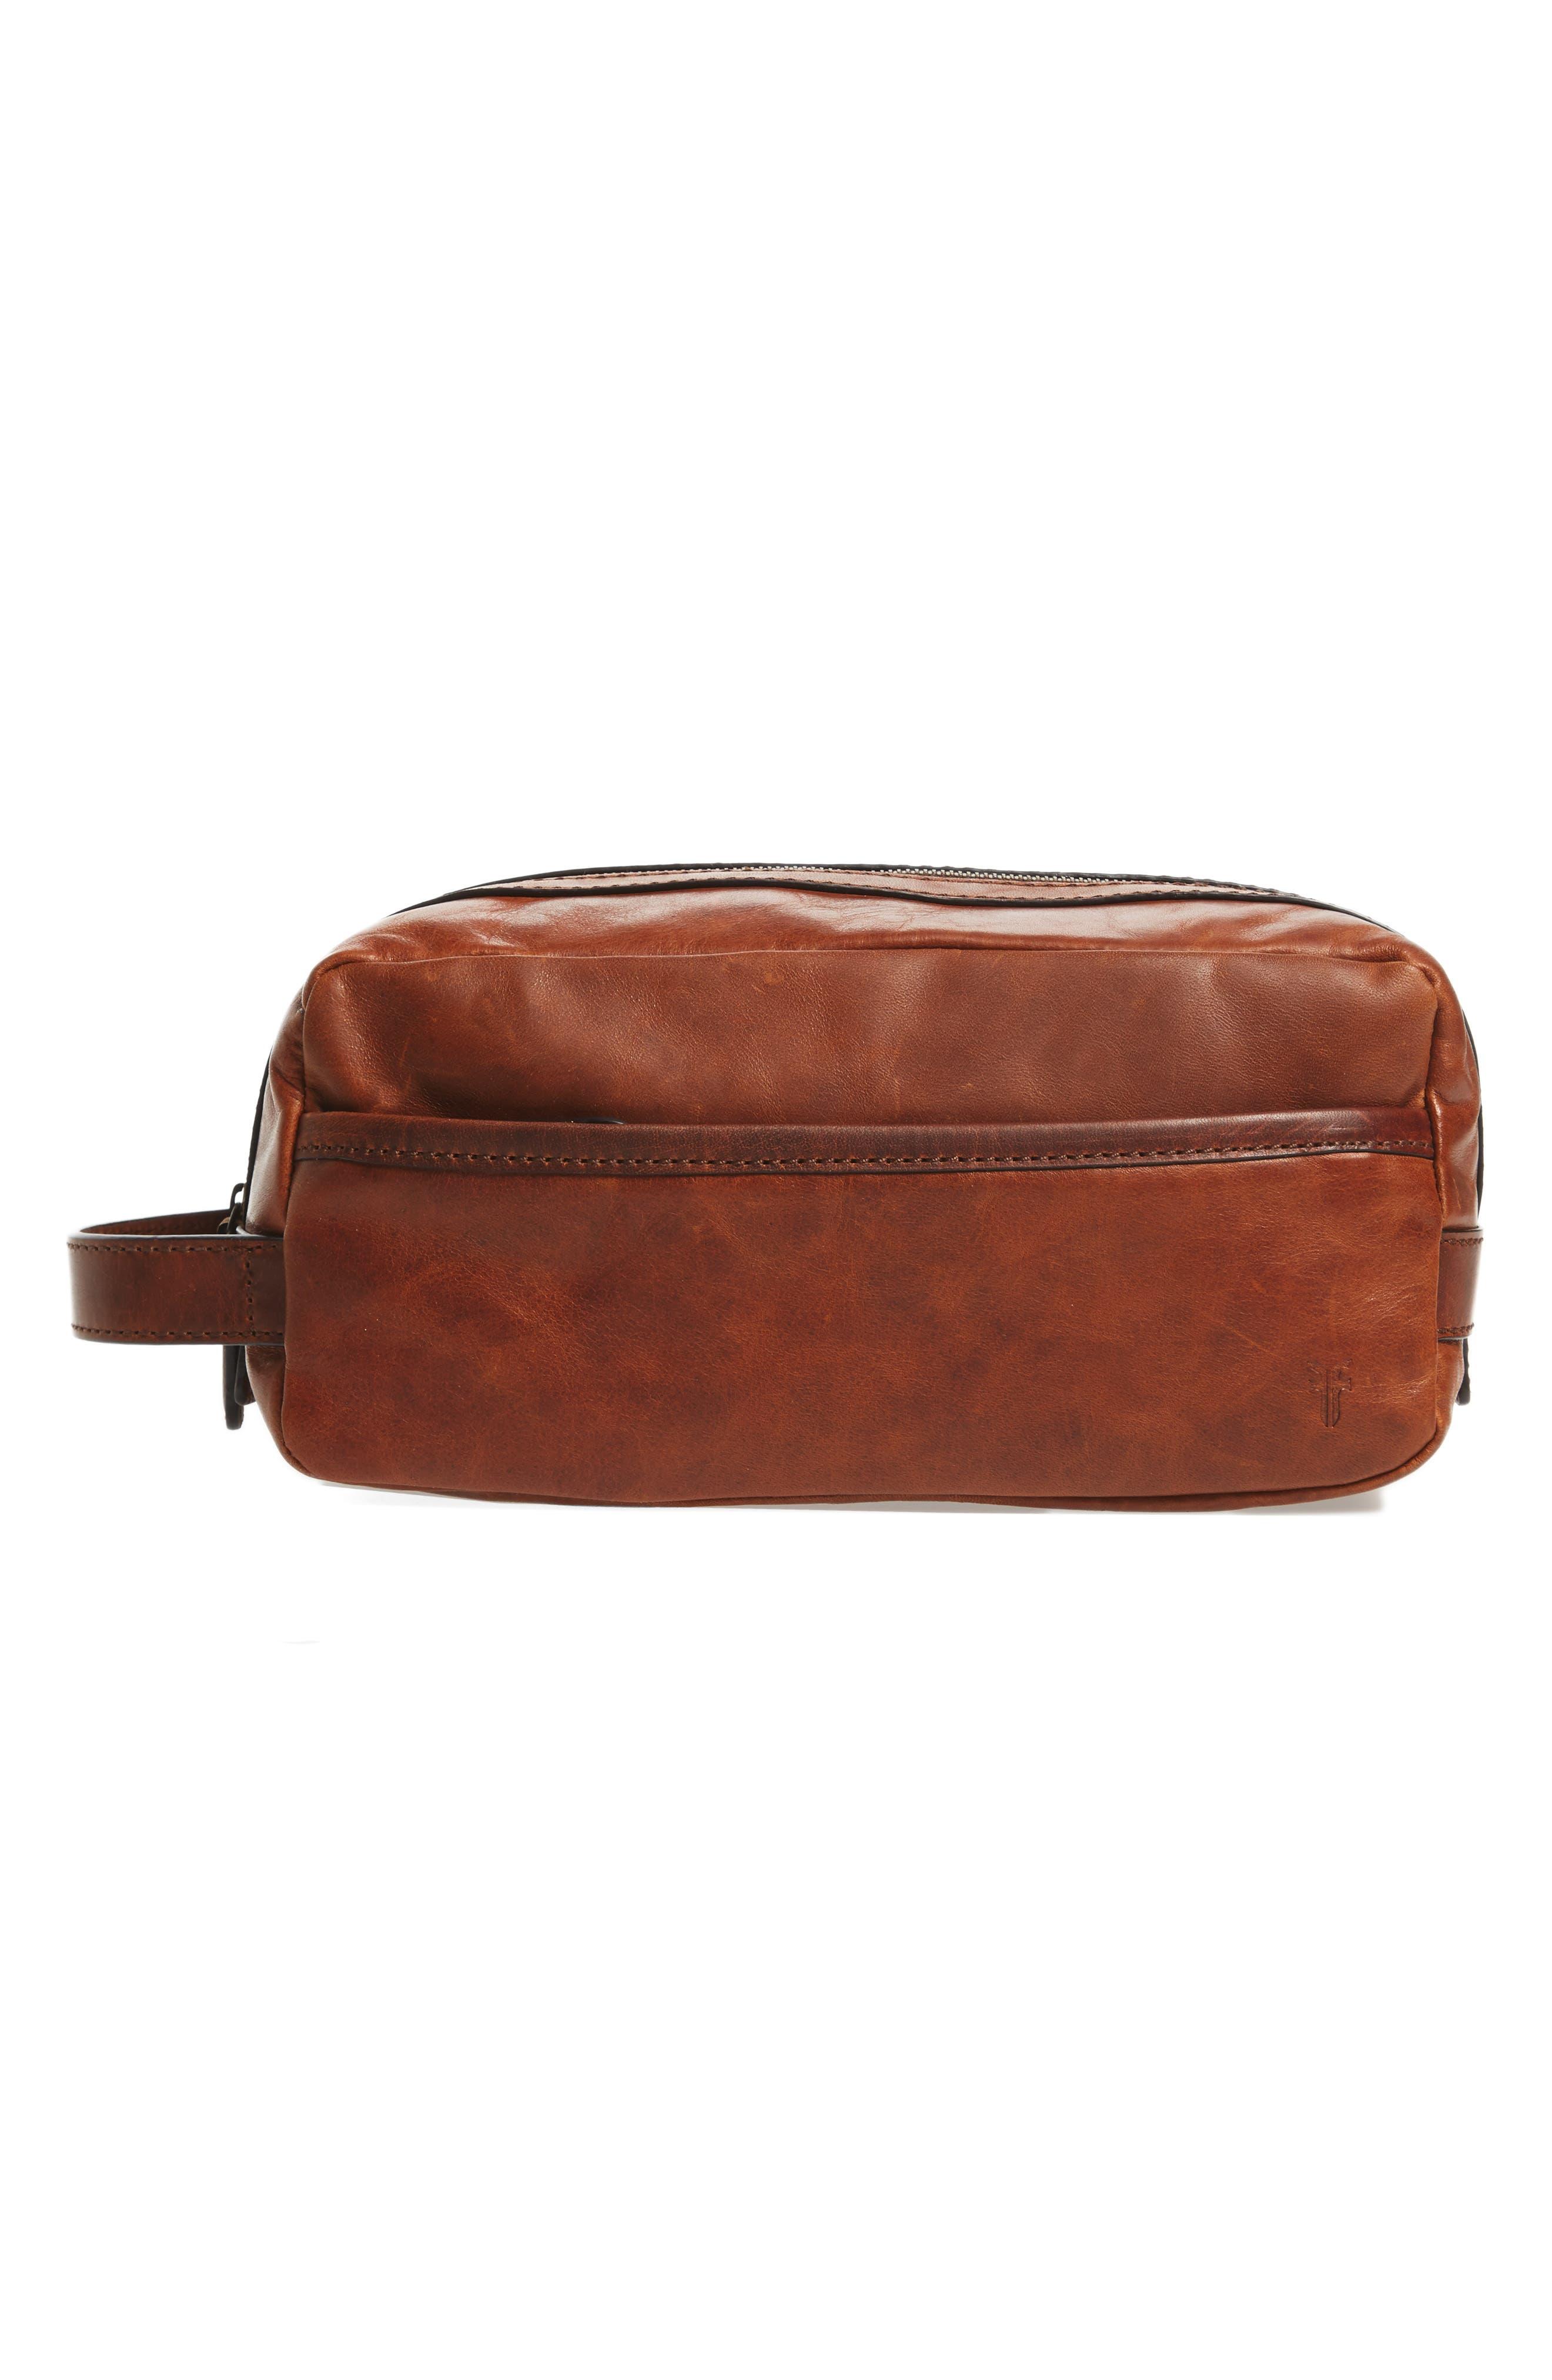 'Logan' Leather Travel Kit,                             Main thumbnail 1, color,                             Cognac